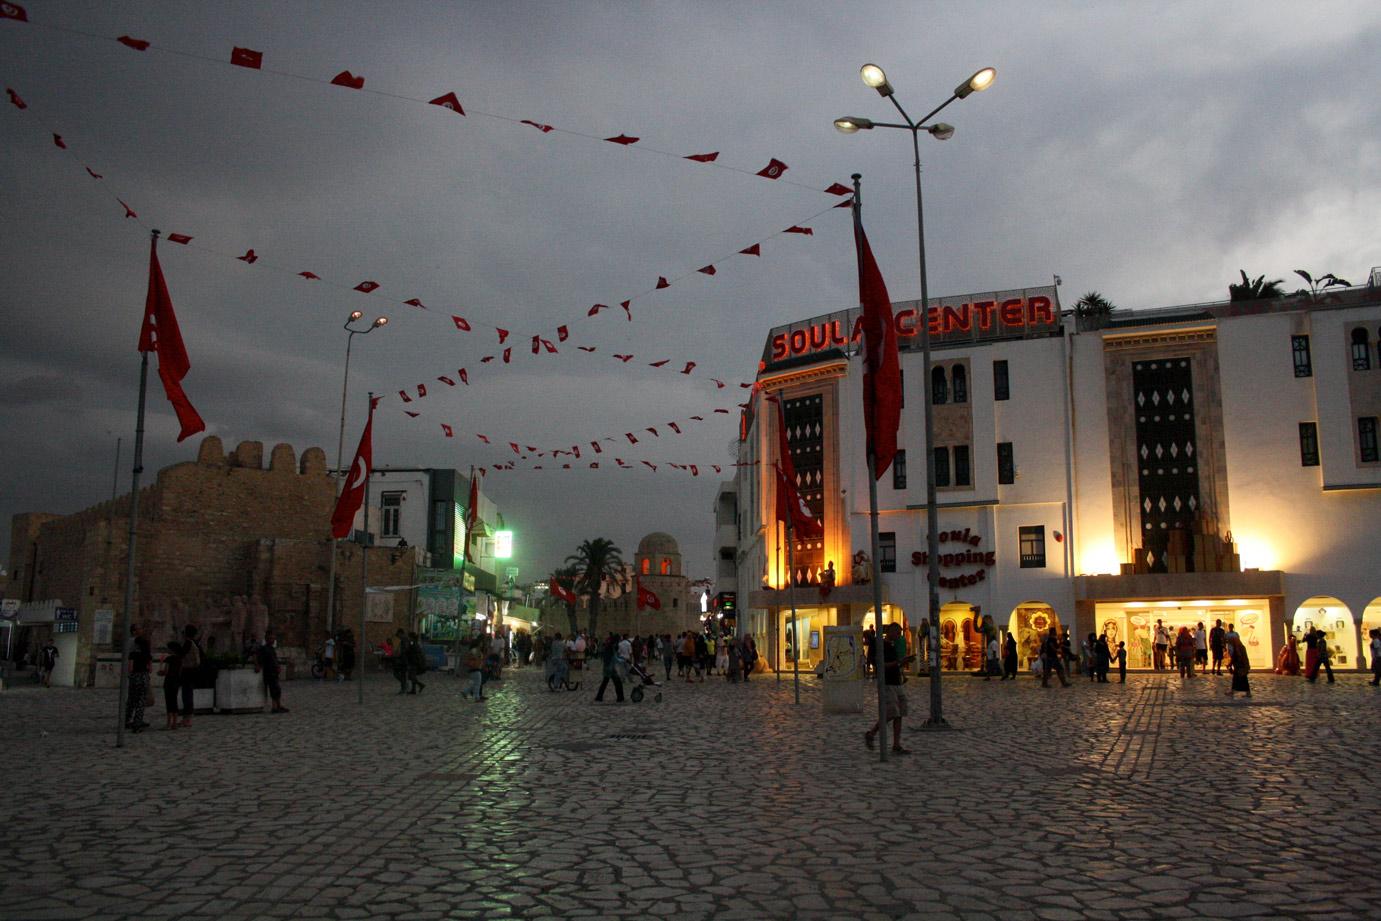 TUNISIA: PHOTO DIARY II. 2